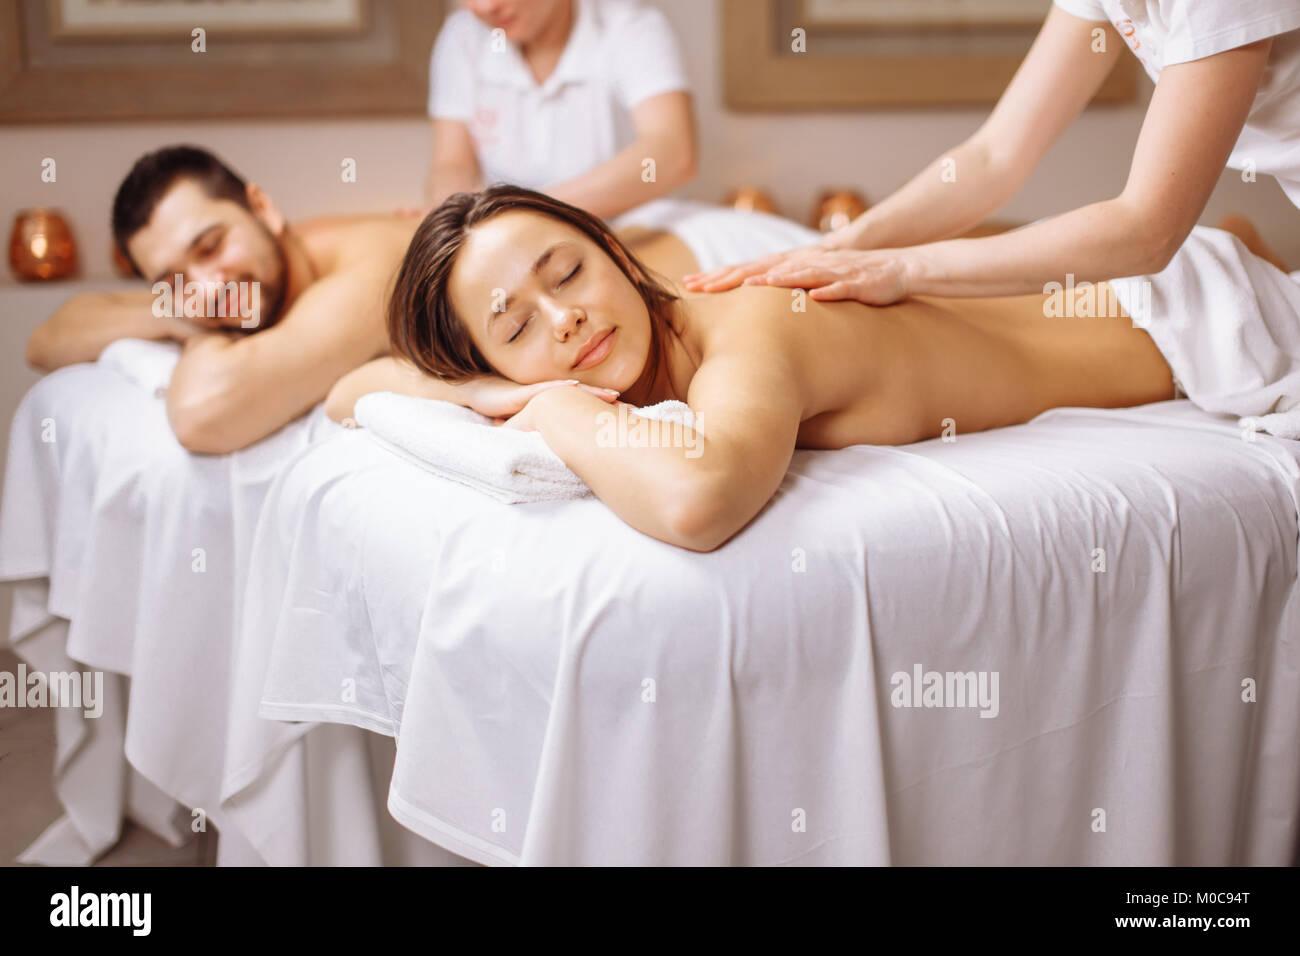 center massages stock photos center massages stock. Black Bedroom Furniture Sets. Home Design Ideas